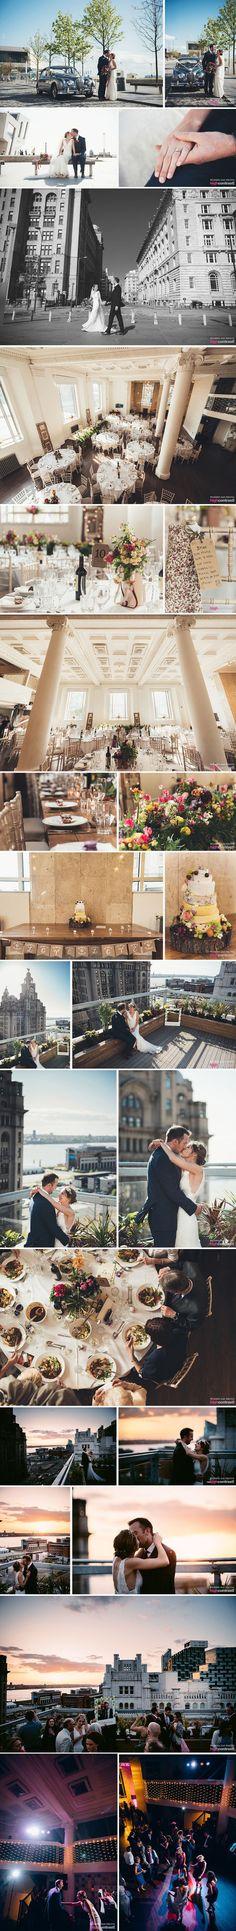 Oh me oh my Wedding, West Africa House, Liverpool - Wedding Day Photos  #Liverpool #WestAfricaHouse #Wedding #couple #married #sunshine #flowers #Wedding #rooftop #cheesecake #weddingcake #cake #sunset #bank #WDP #venue #WeddingVenue #inspiration #Ideas #bridal #bride #groom #rings #TableSetting